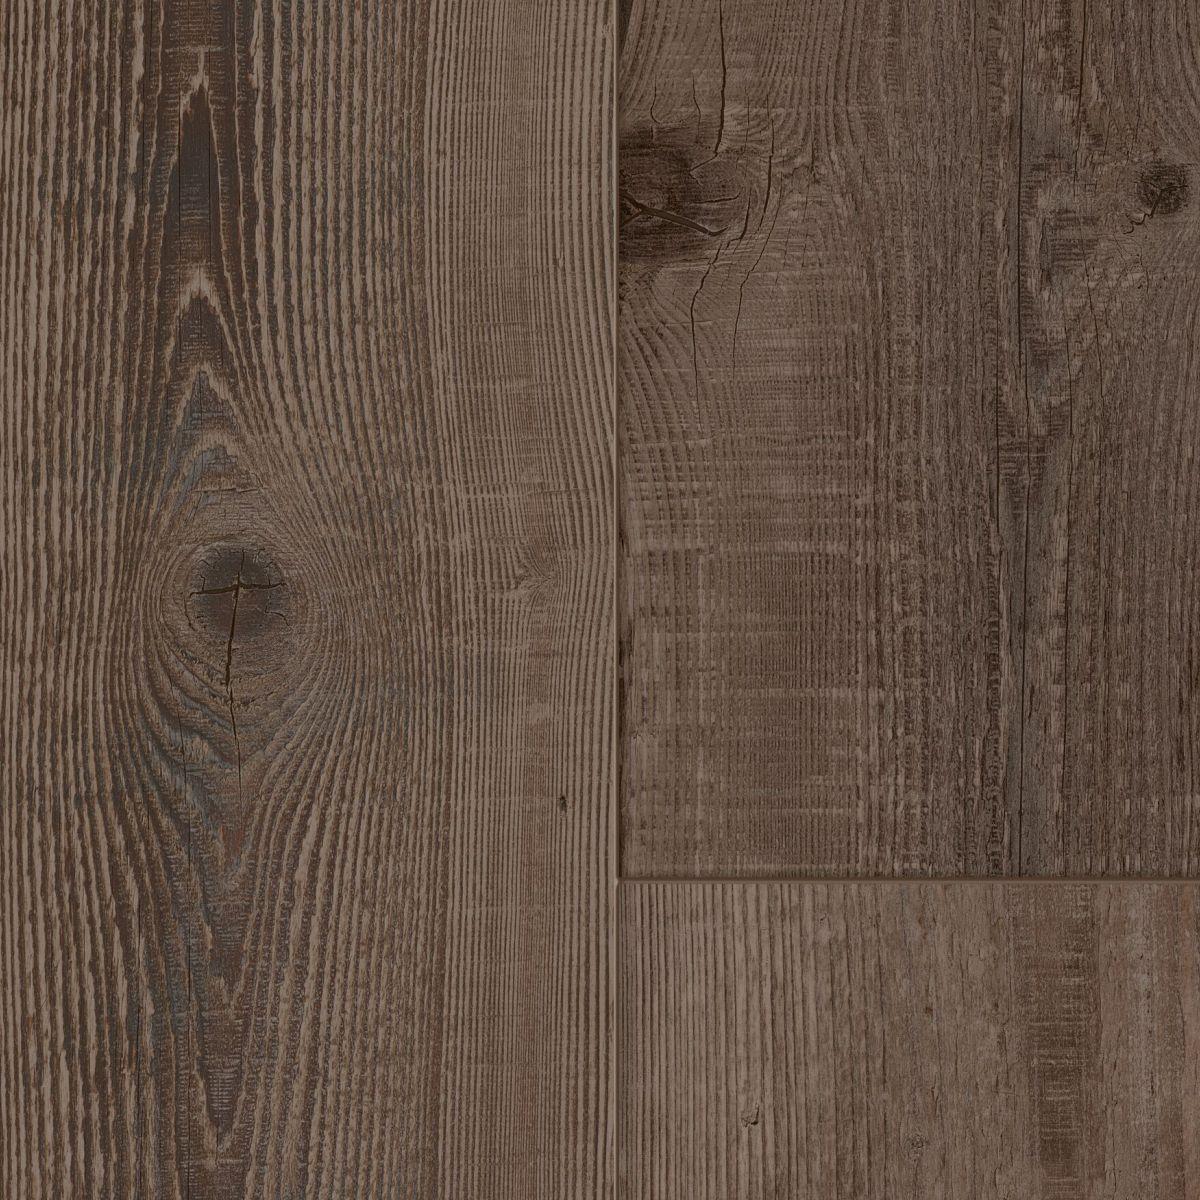 Avatara vloerdelen hout N09 detail